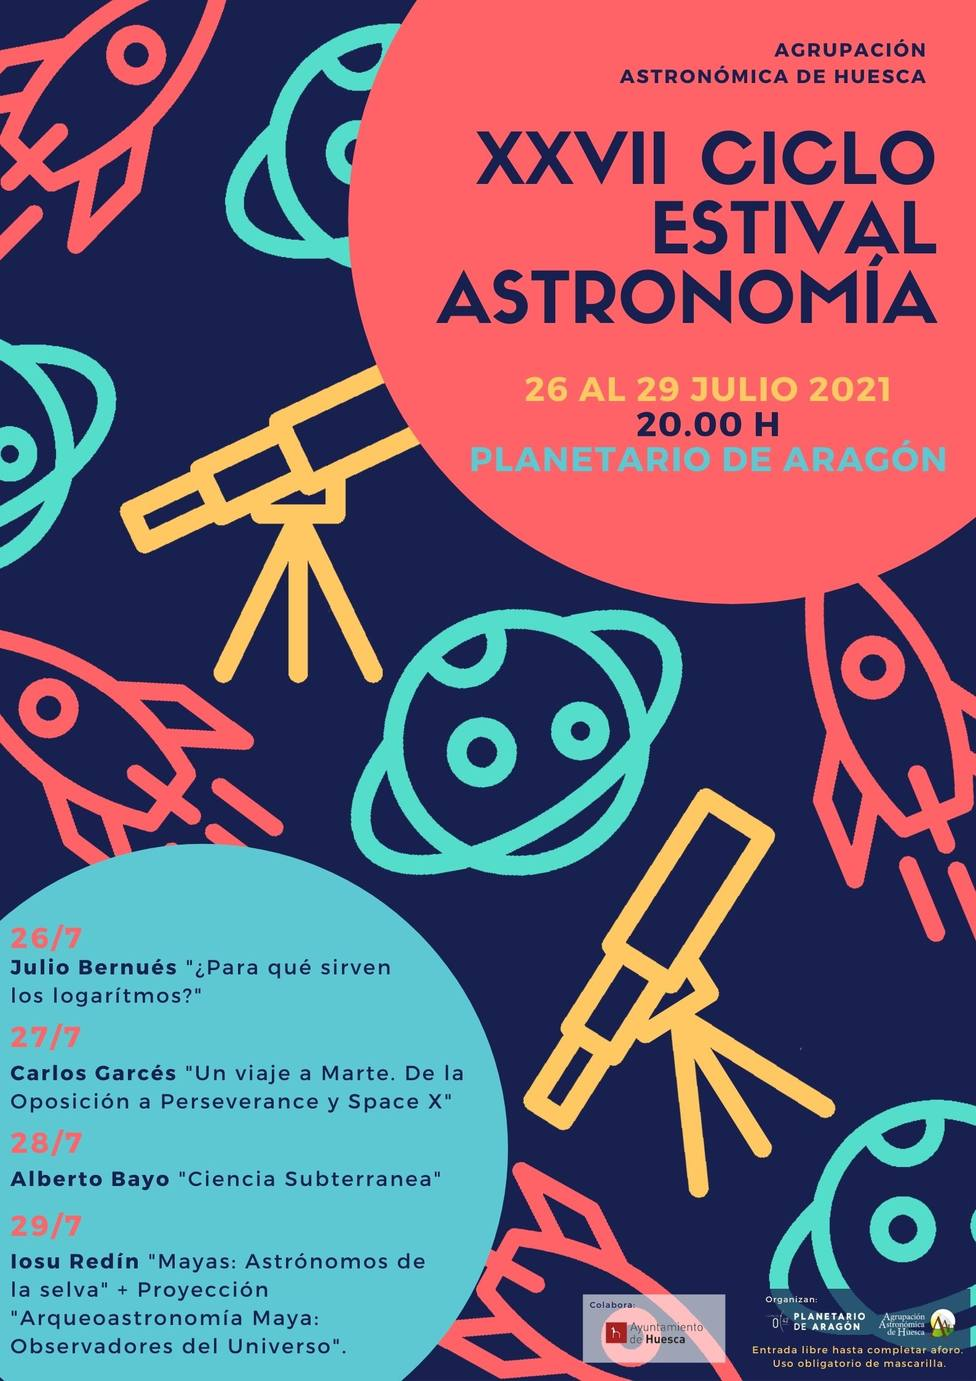 ctv-frm-foto-agrupacion-astronomica